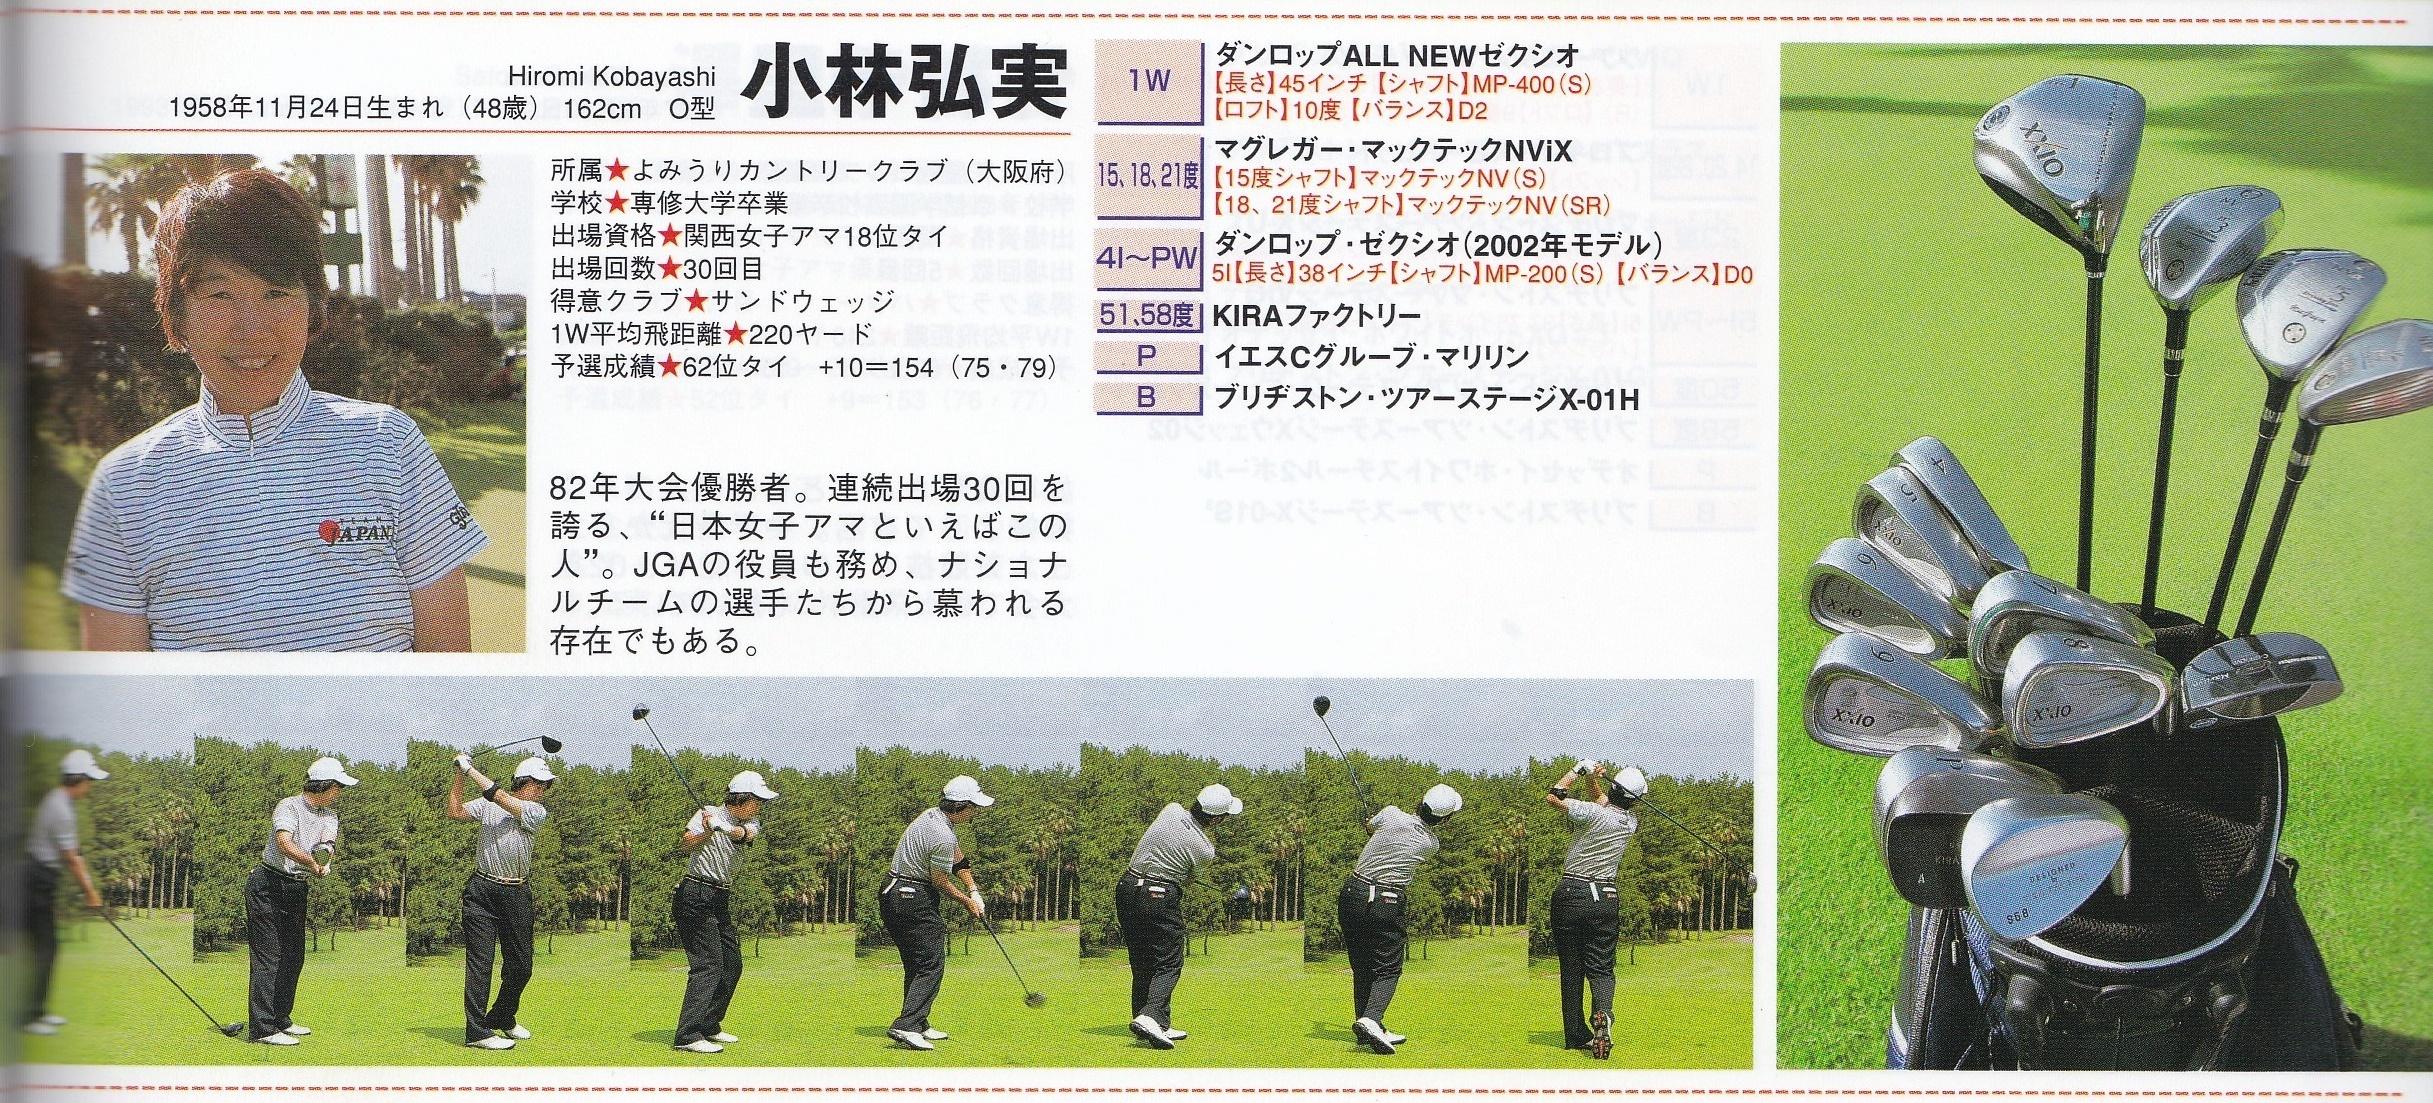 2007.9 Golf Style Japan women's amateur club's setting